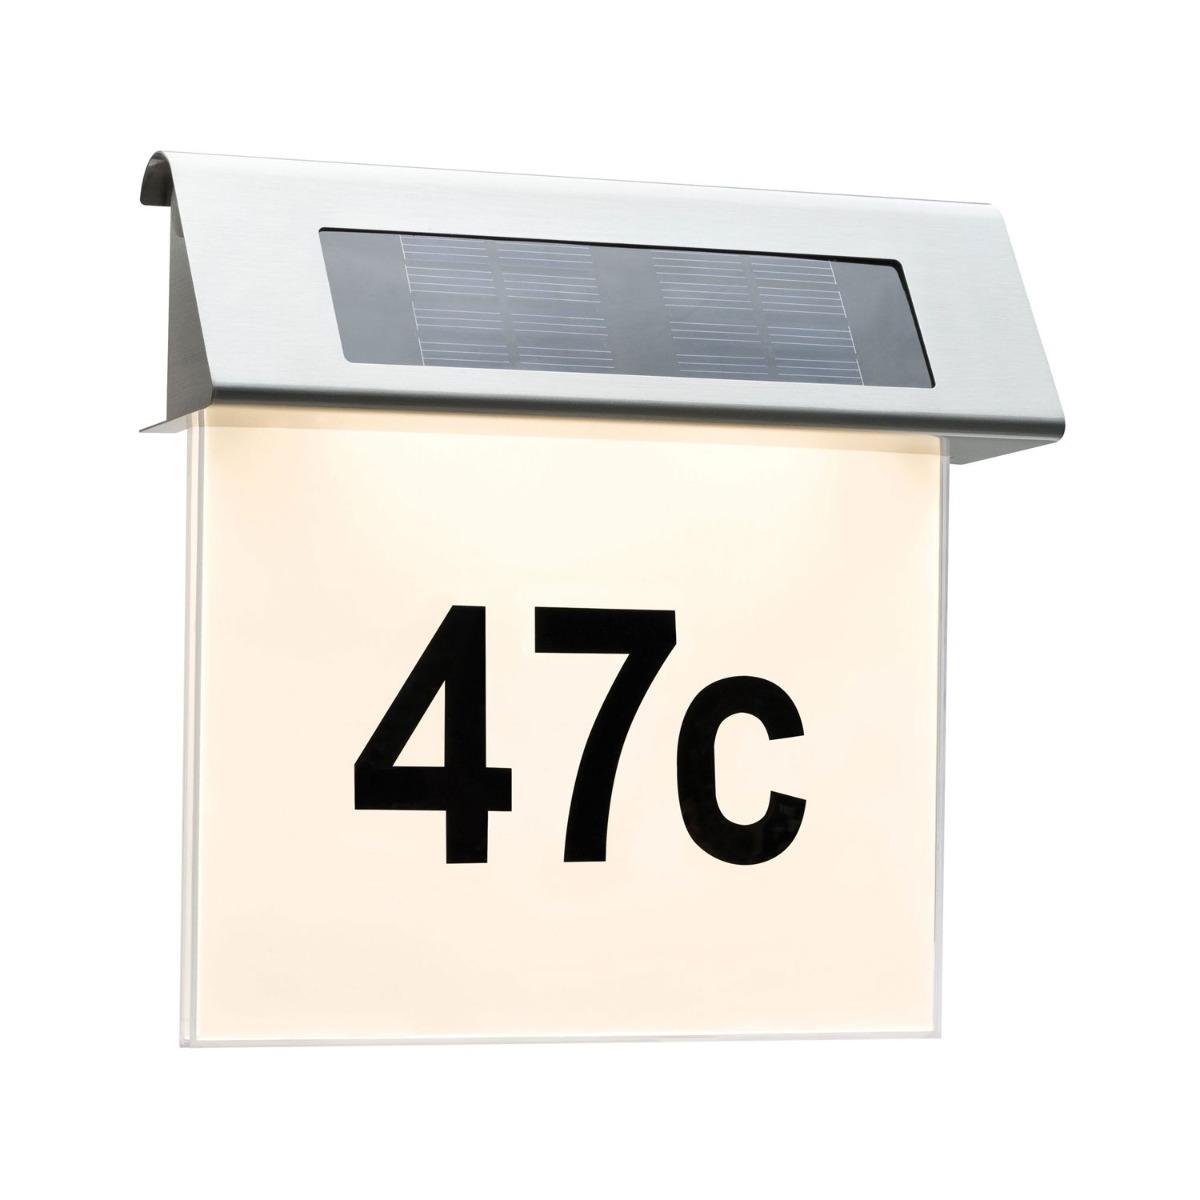 Paulmann Solar LED Huisnummer Muurlamp Wit Roestvrij Staal IP44 1x 0,2W